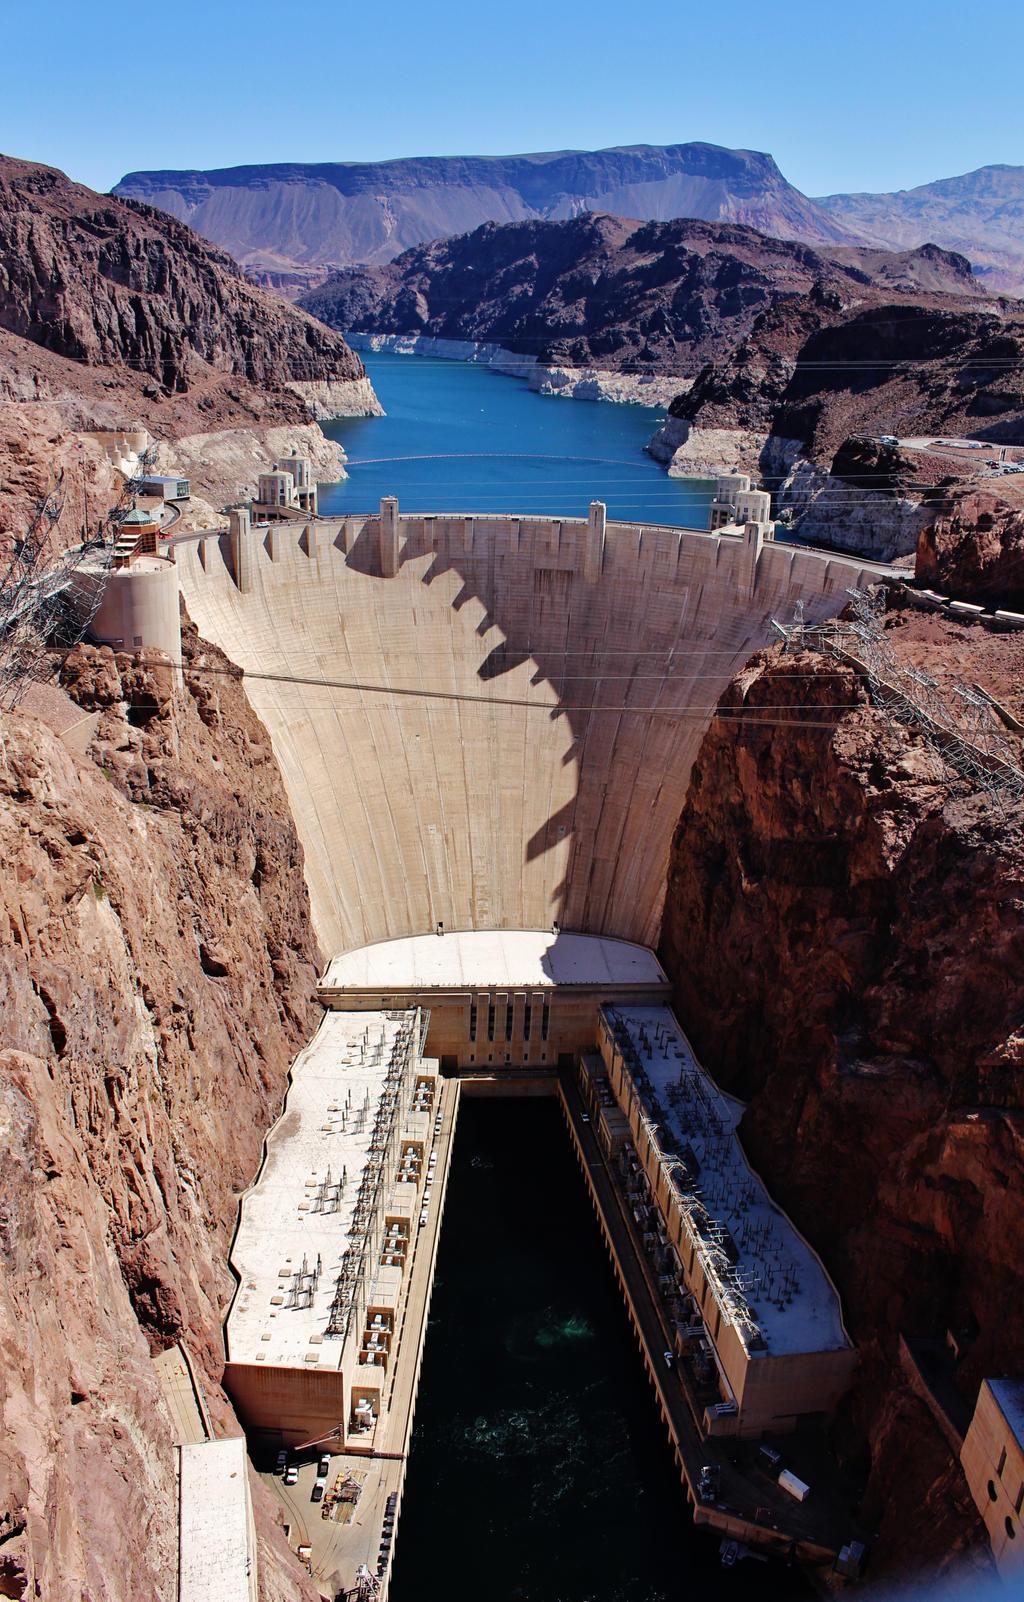 Hoover Dam by AthenaIce